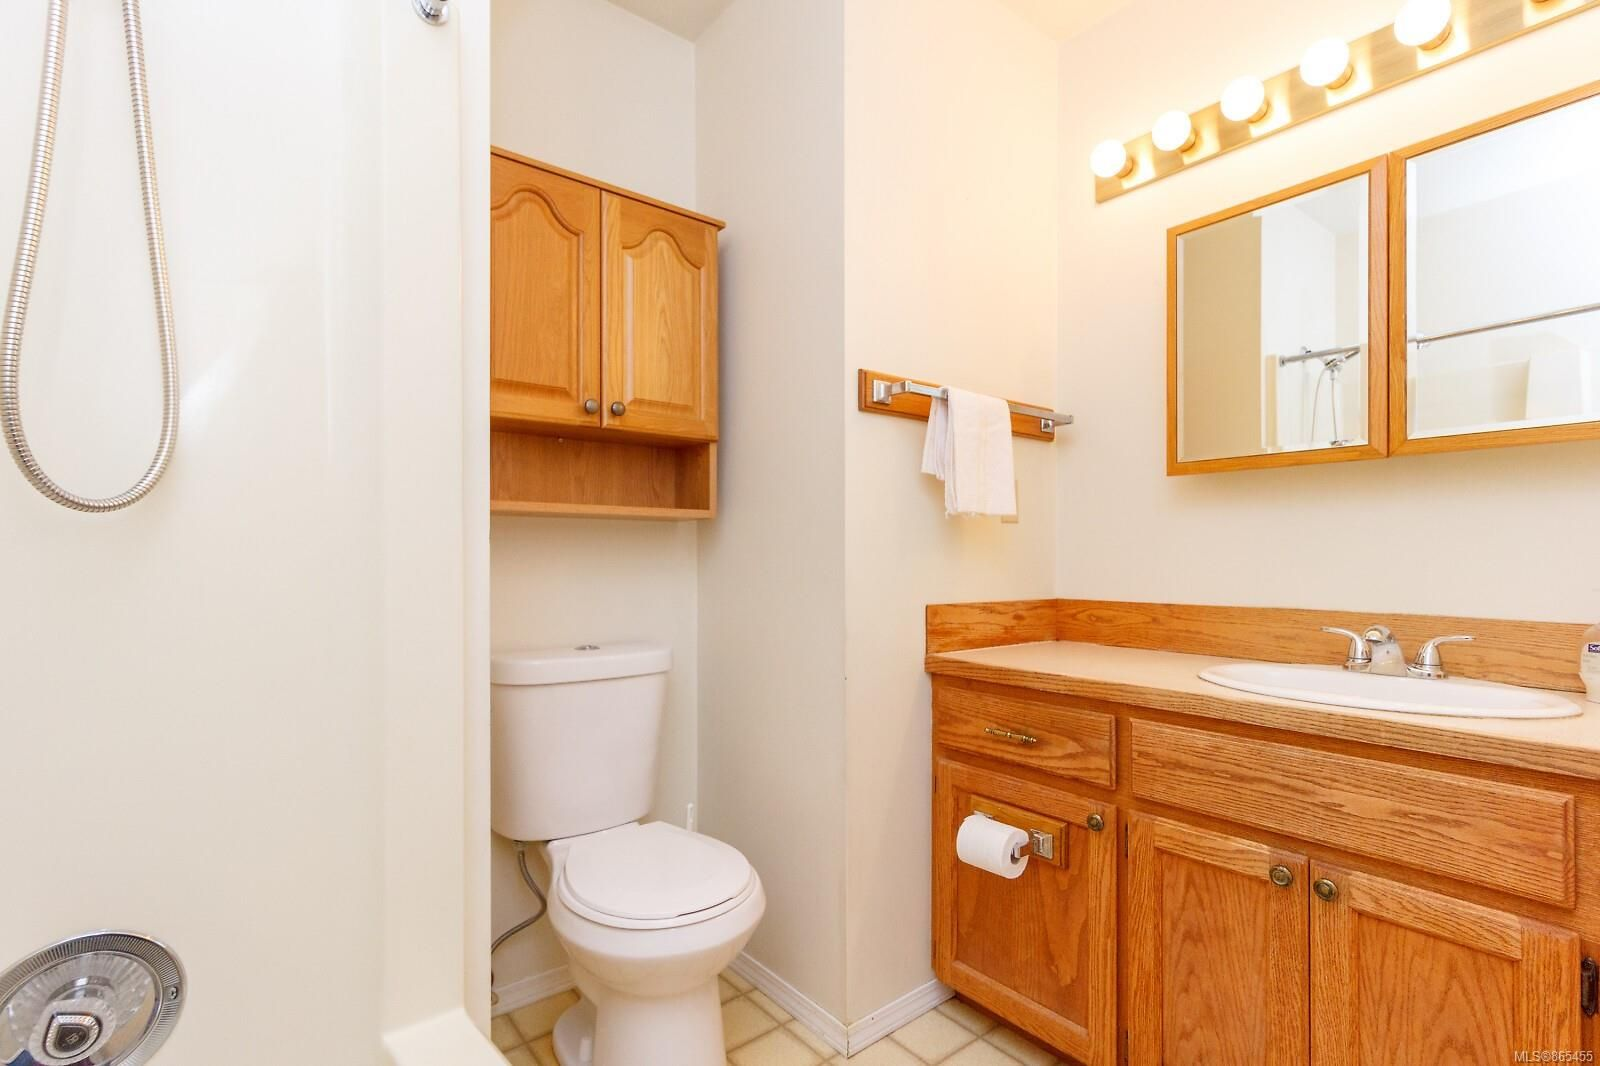 Photo 20: Photos: 399 Beech Ave in : Du East Duncan House for sale (Duncan)  : MLS®# 865455